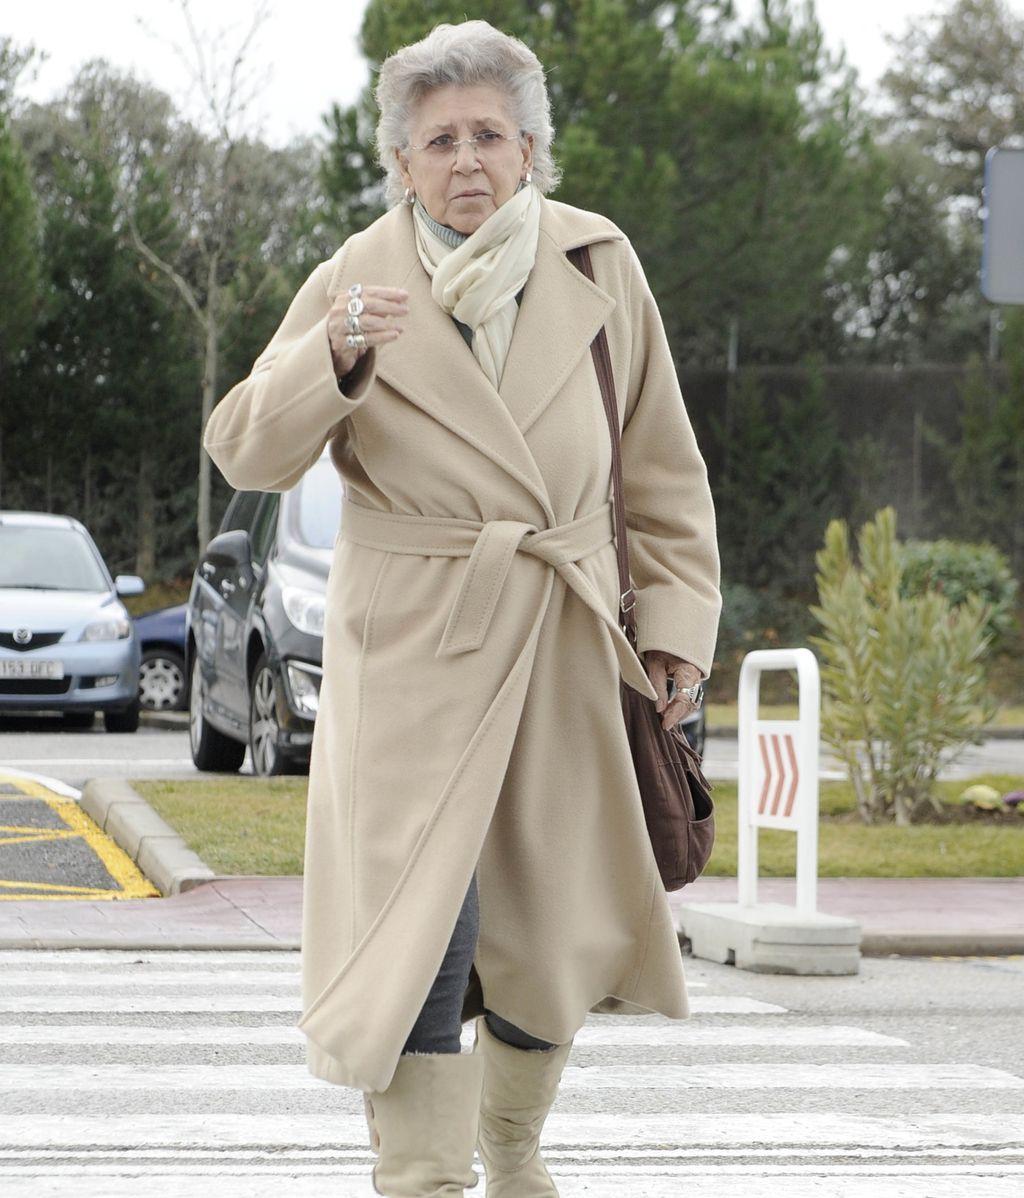 La actriz Pilar Bardem